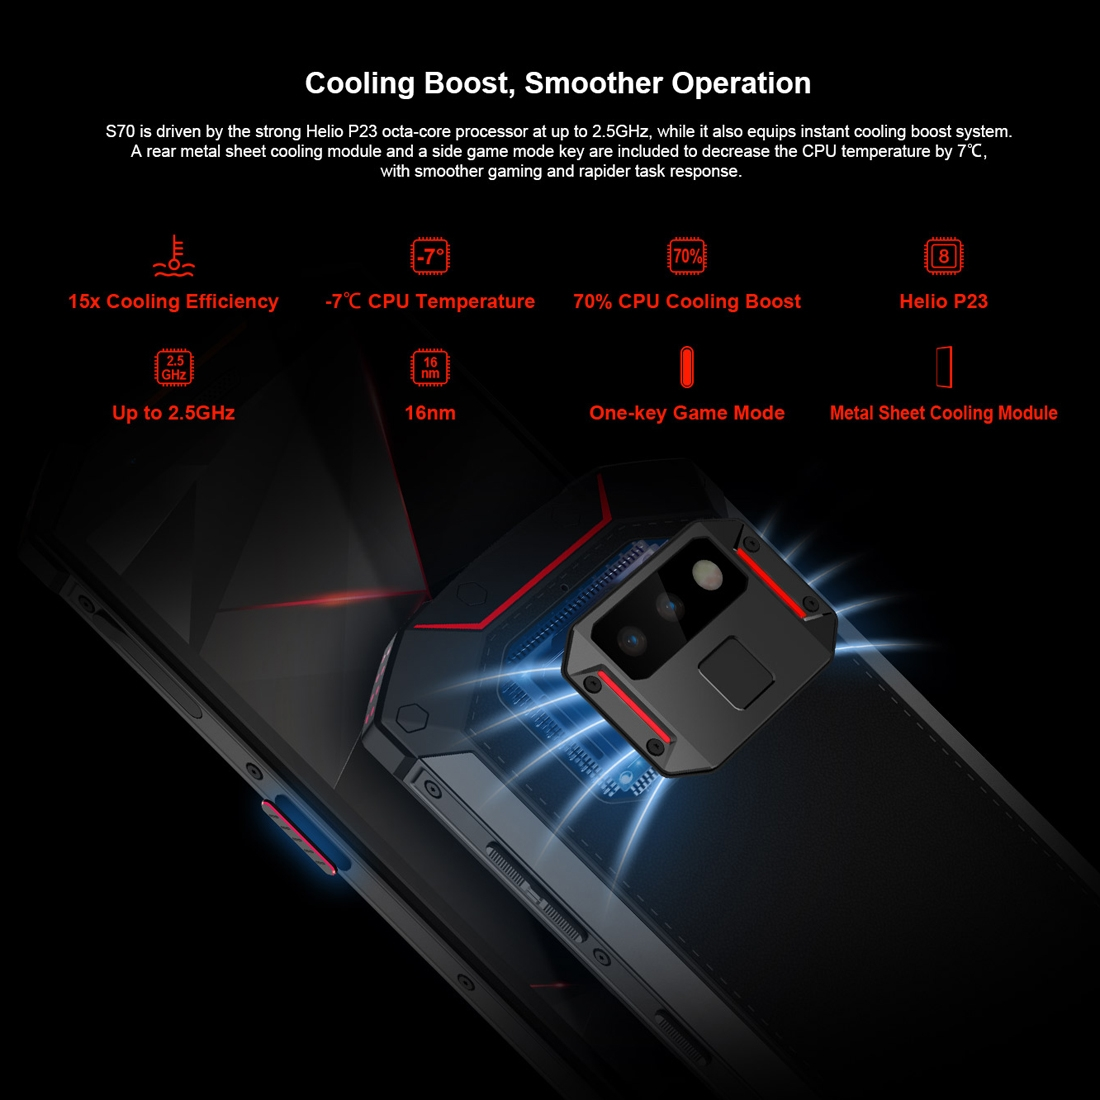 Проектор Смартфон DOOGEE S70 6GB+64GB Защита от влаги пыли ударов по стандарту IP68/IP69K MIL-STD-810G 5500мАч батарея Двойная камера (Фото 6)